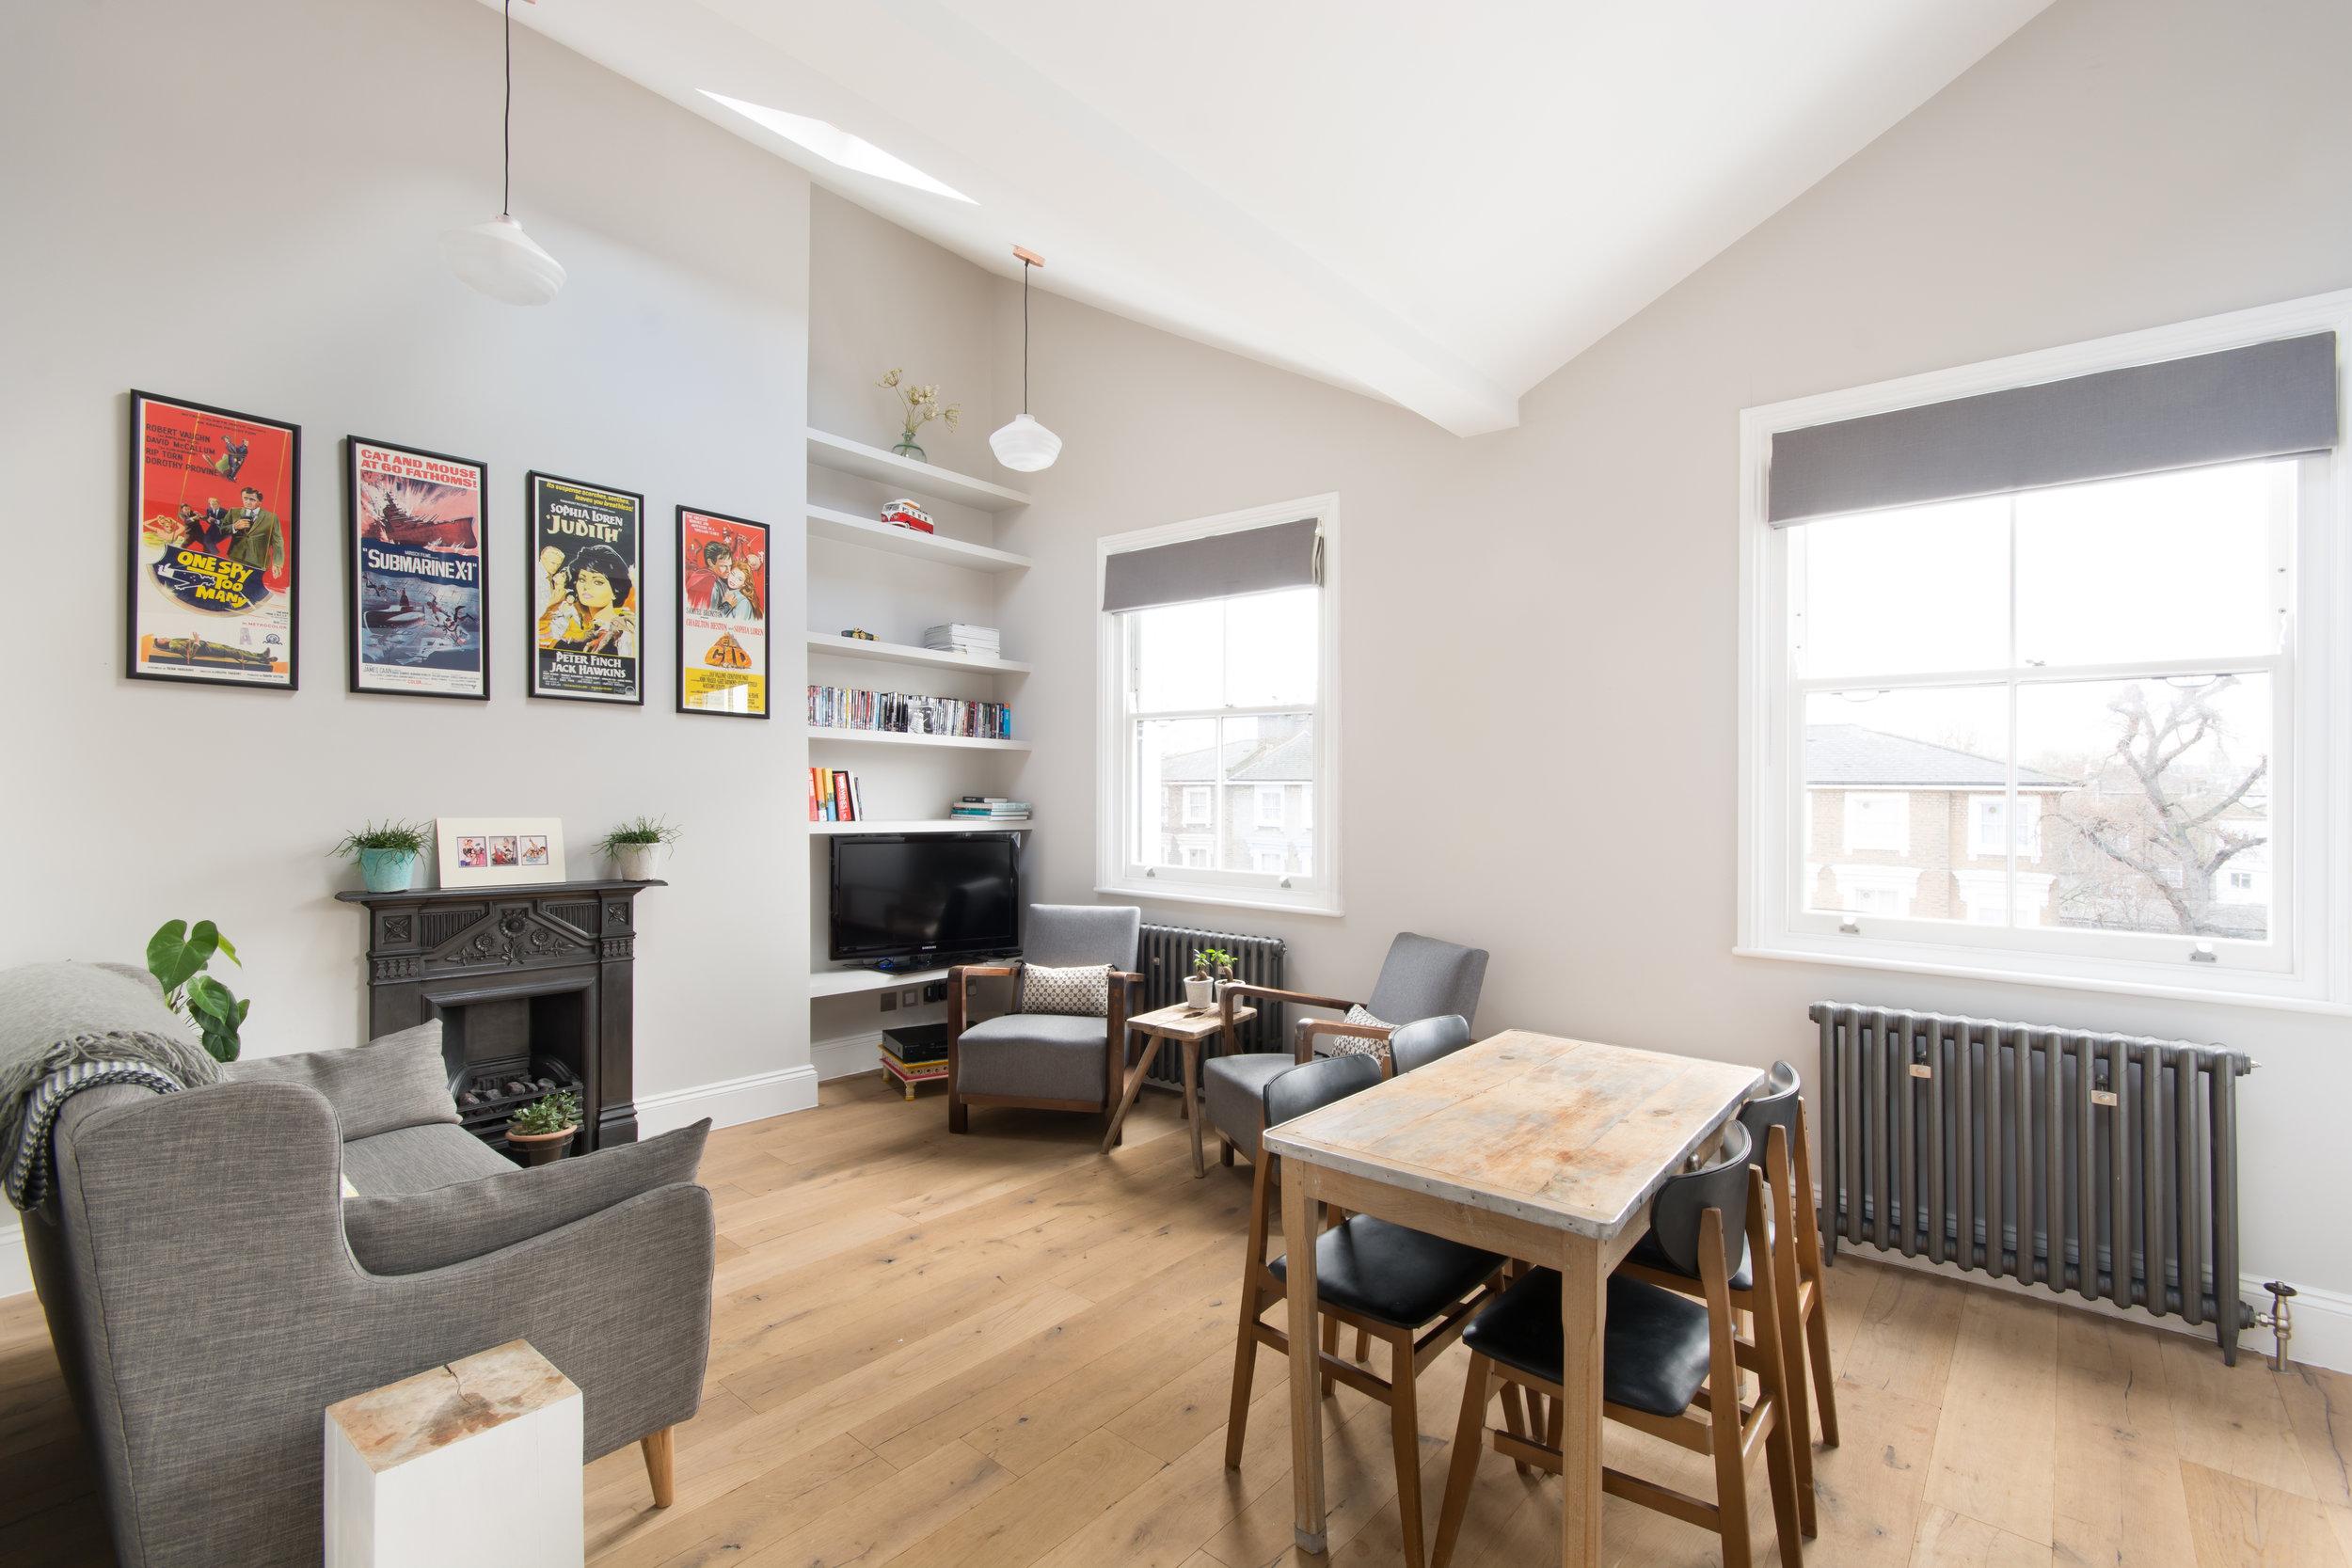 Domus-Nova-Lancaster-Road-London-Property-To-Rent (1).jpg